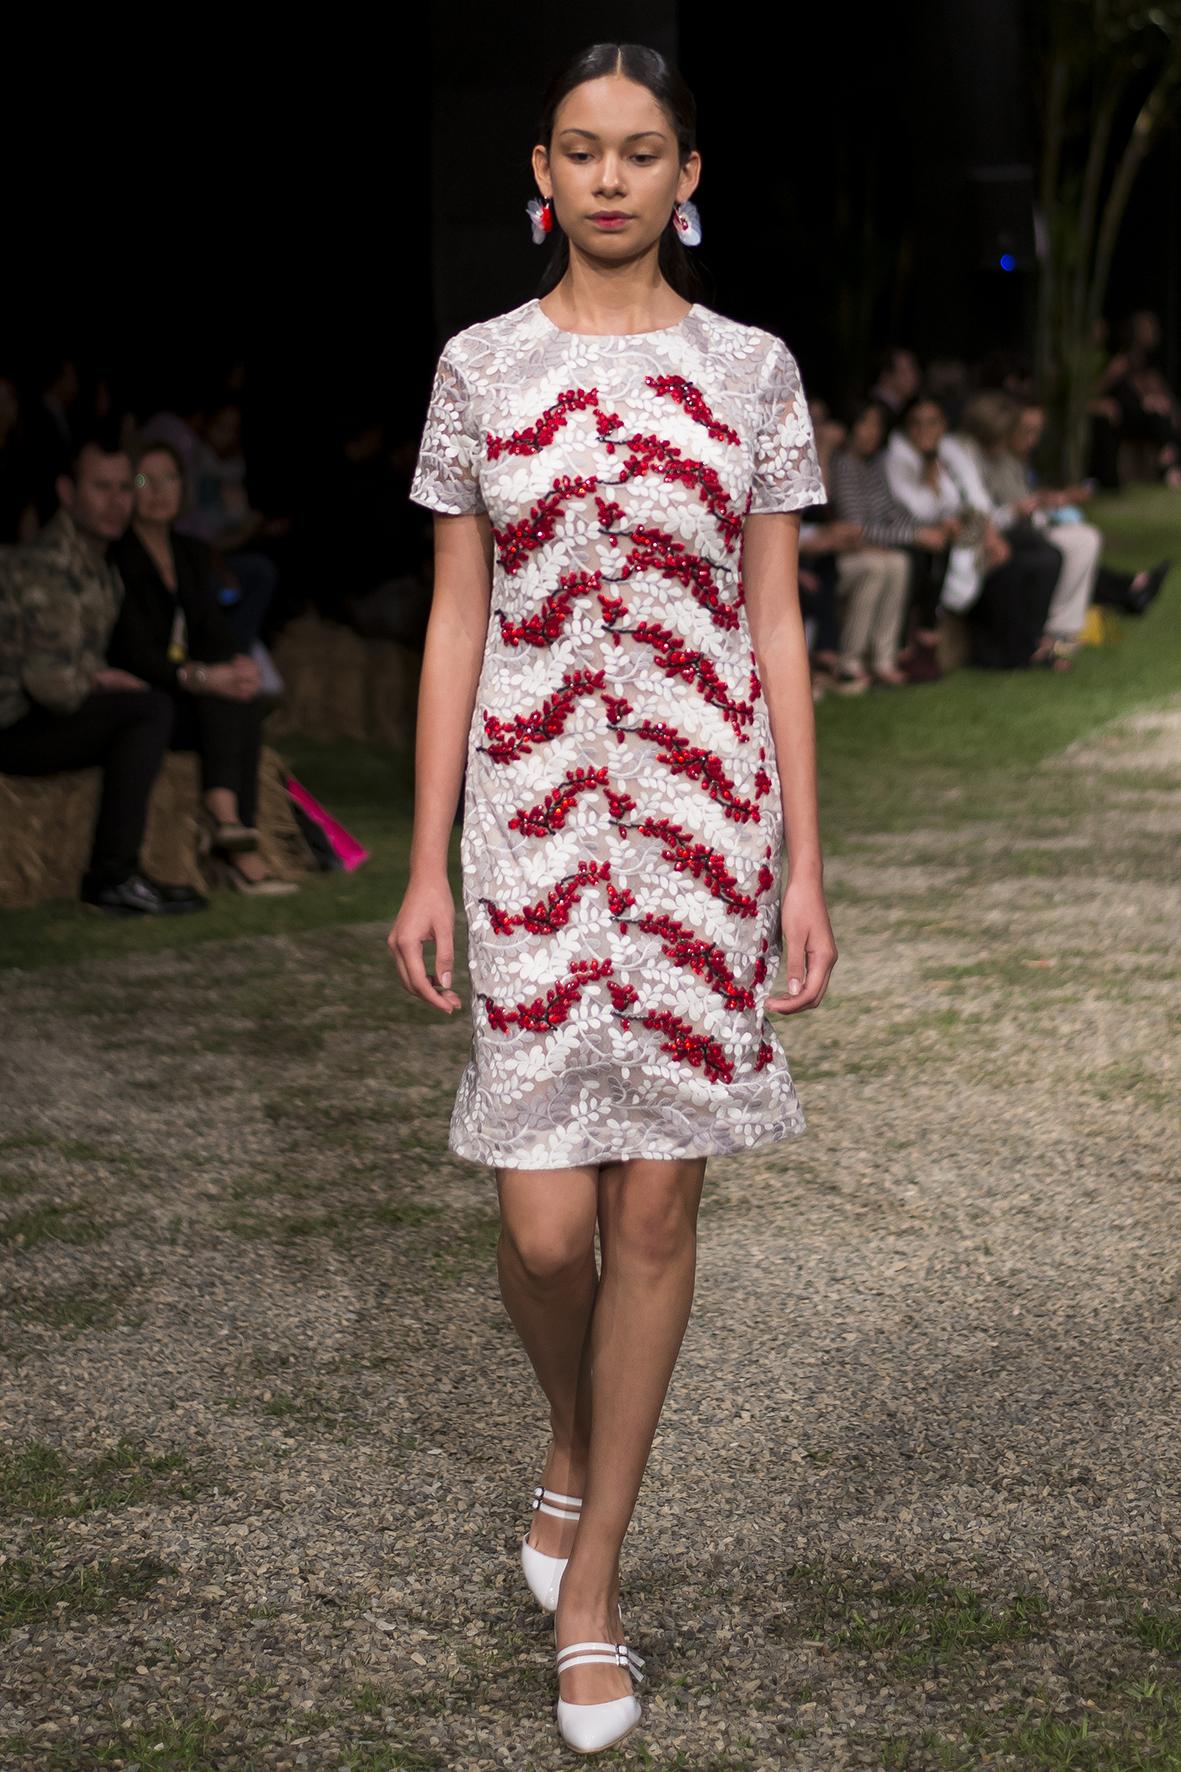 It Project evolet den tavara ceam enrique canales delrieu carolina tola eriko peru fashion moda peruana -  07.JPG